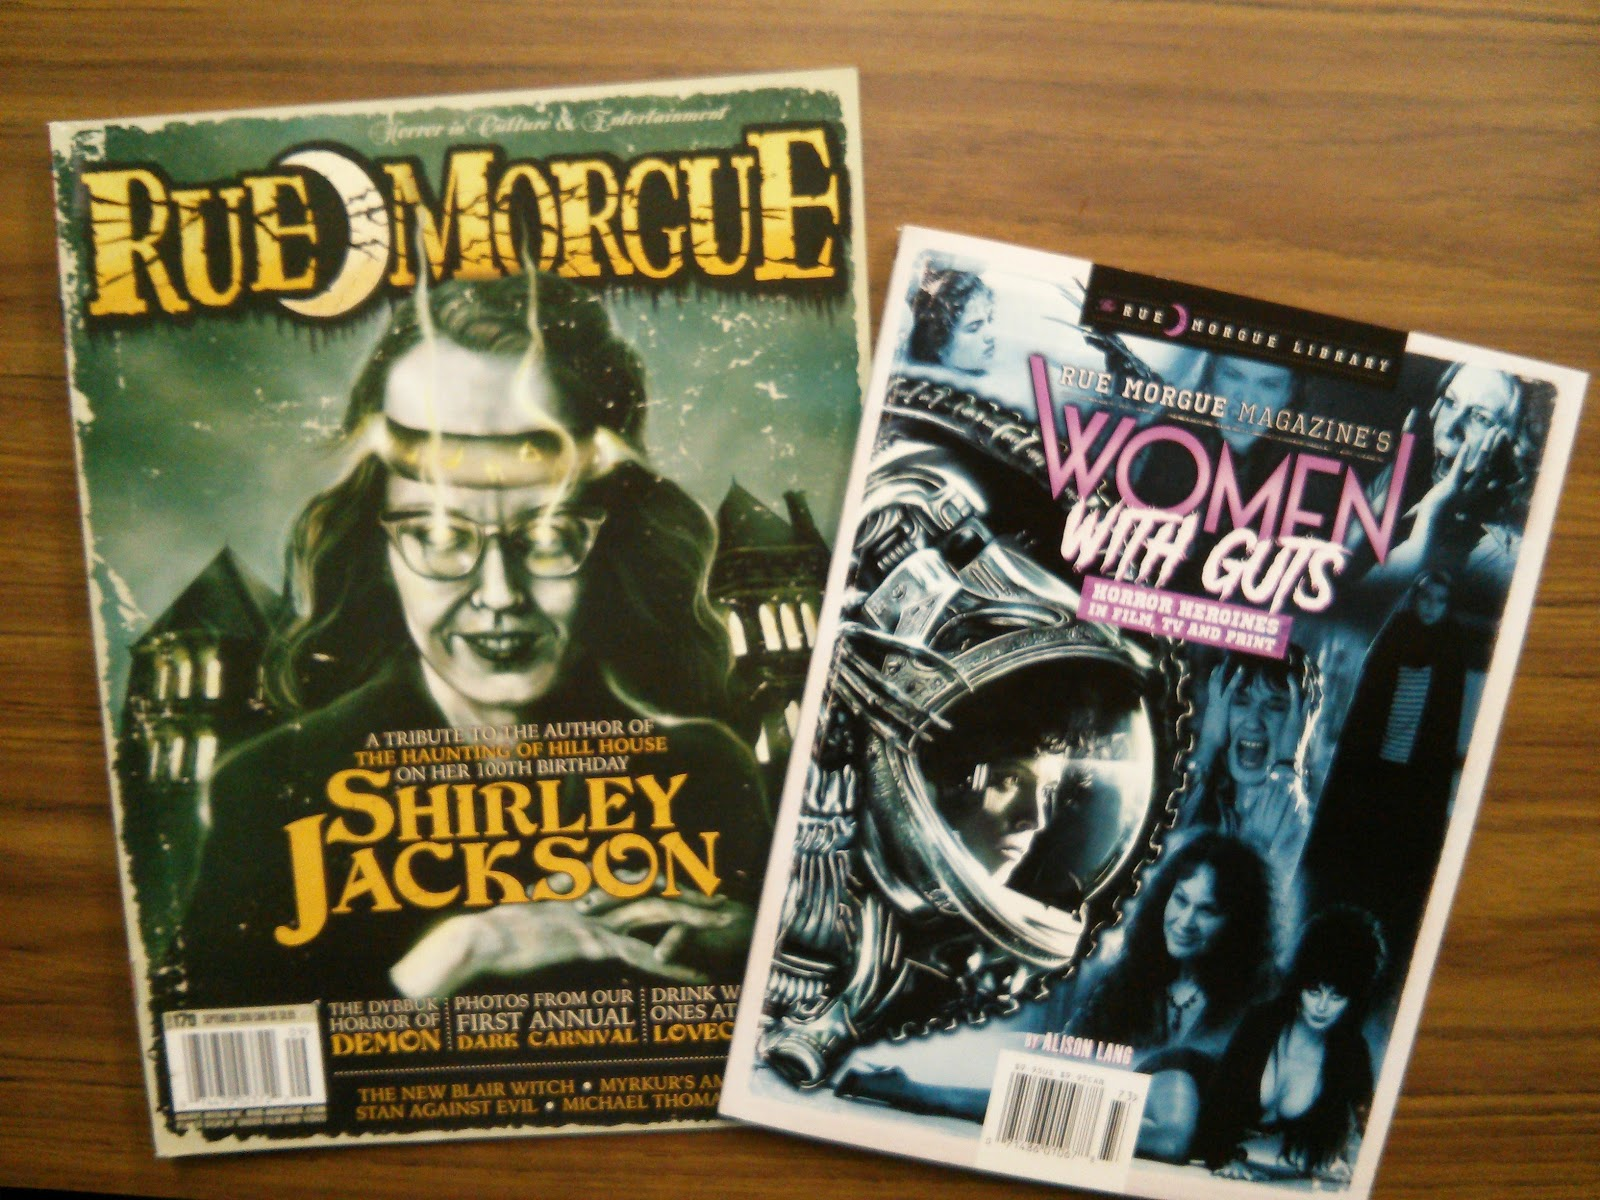 Fluffy The Vampire Slayer - Cats and Horror blog: June 2017